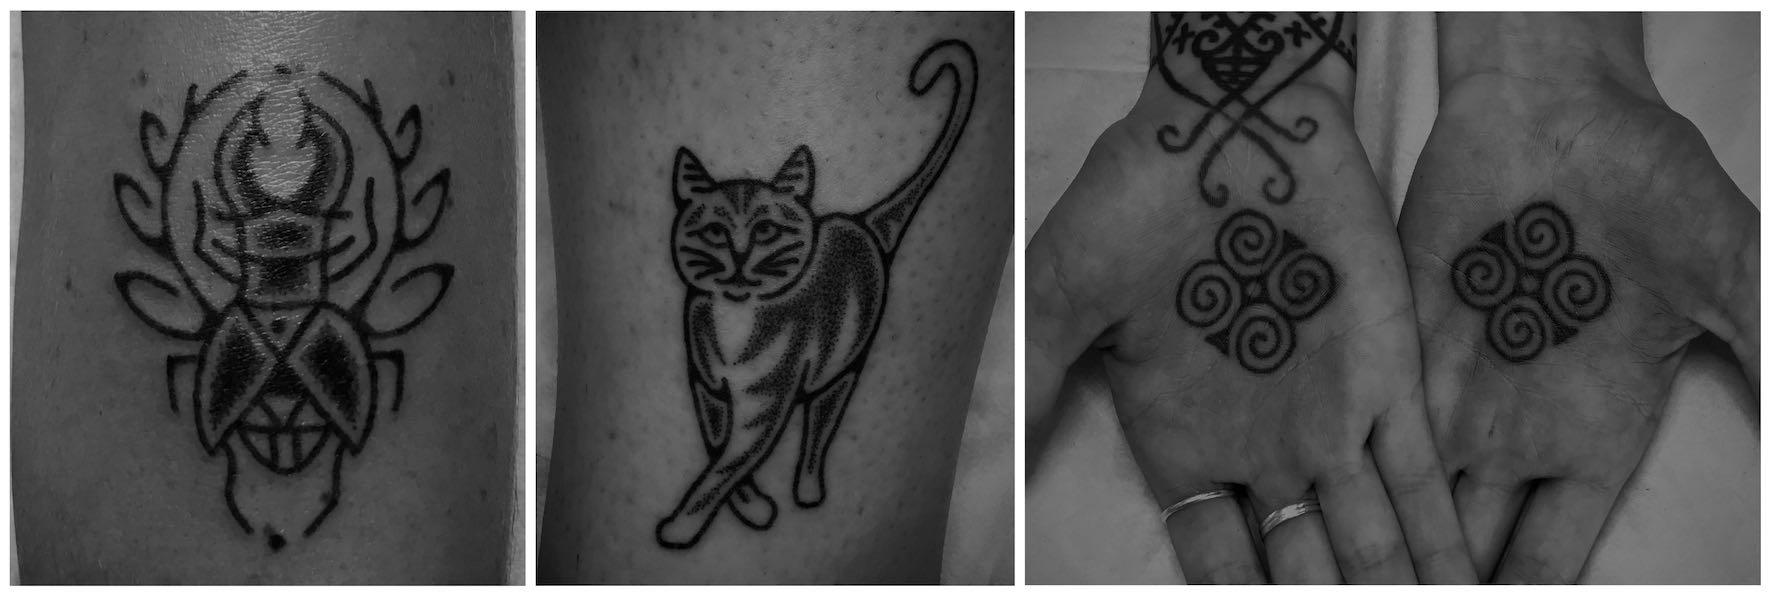 Hand Poke tattoos done by Tarzan